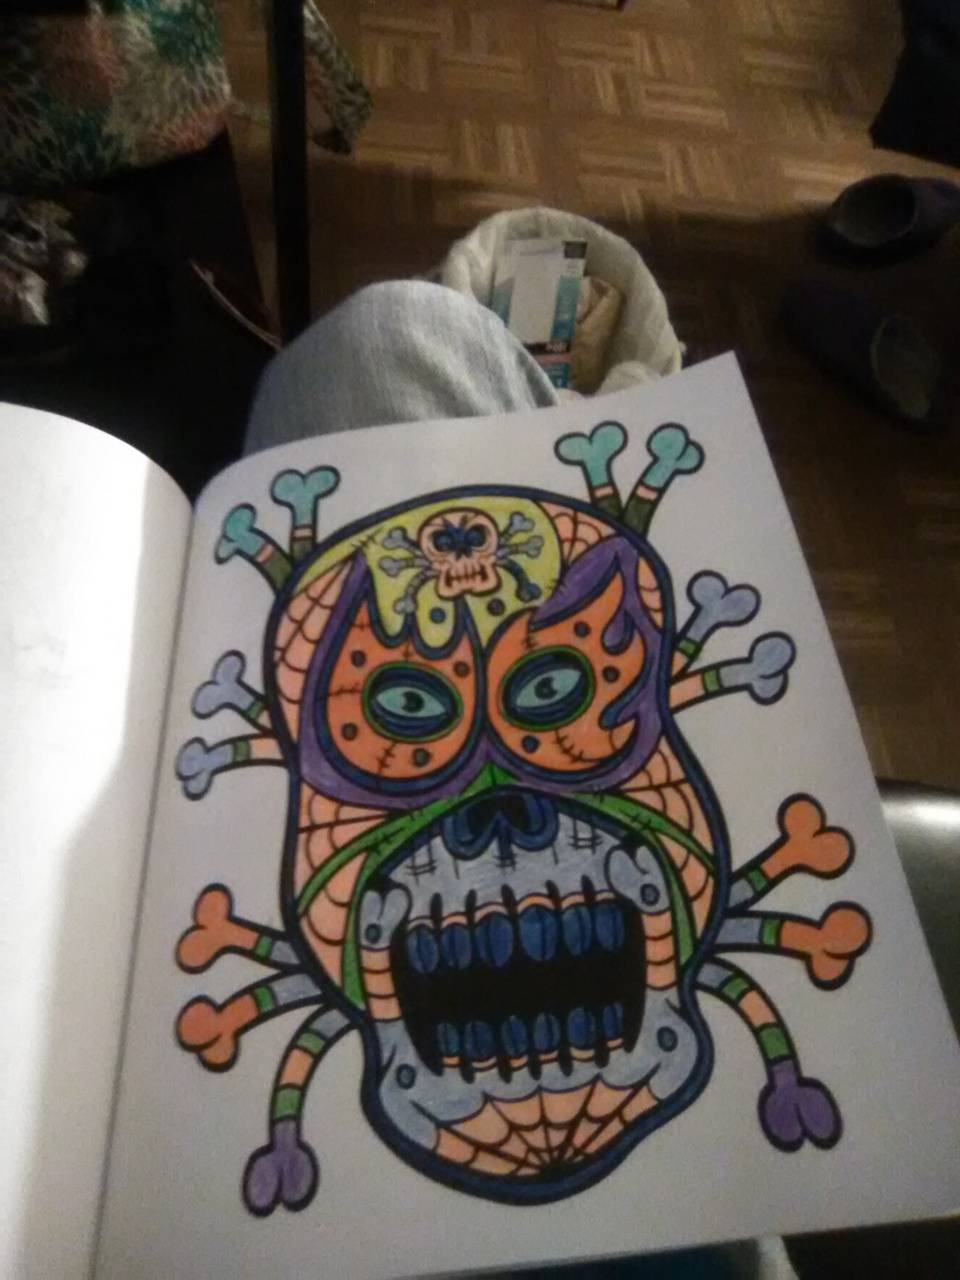 A skull with bones